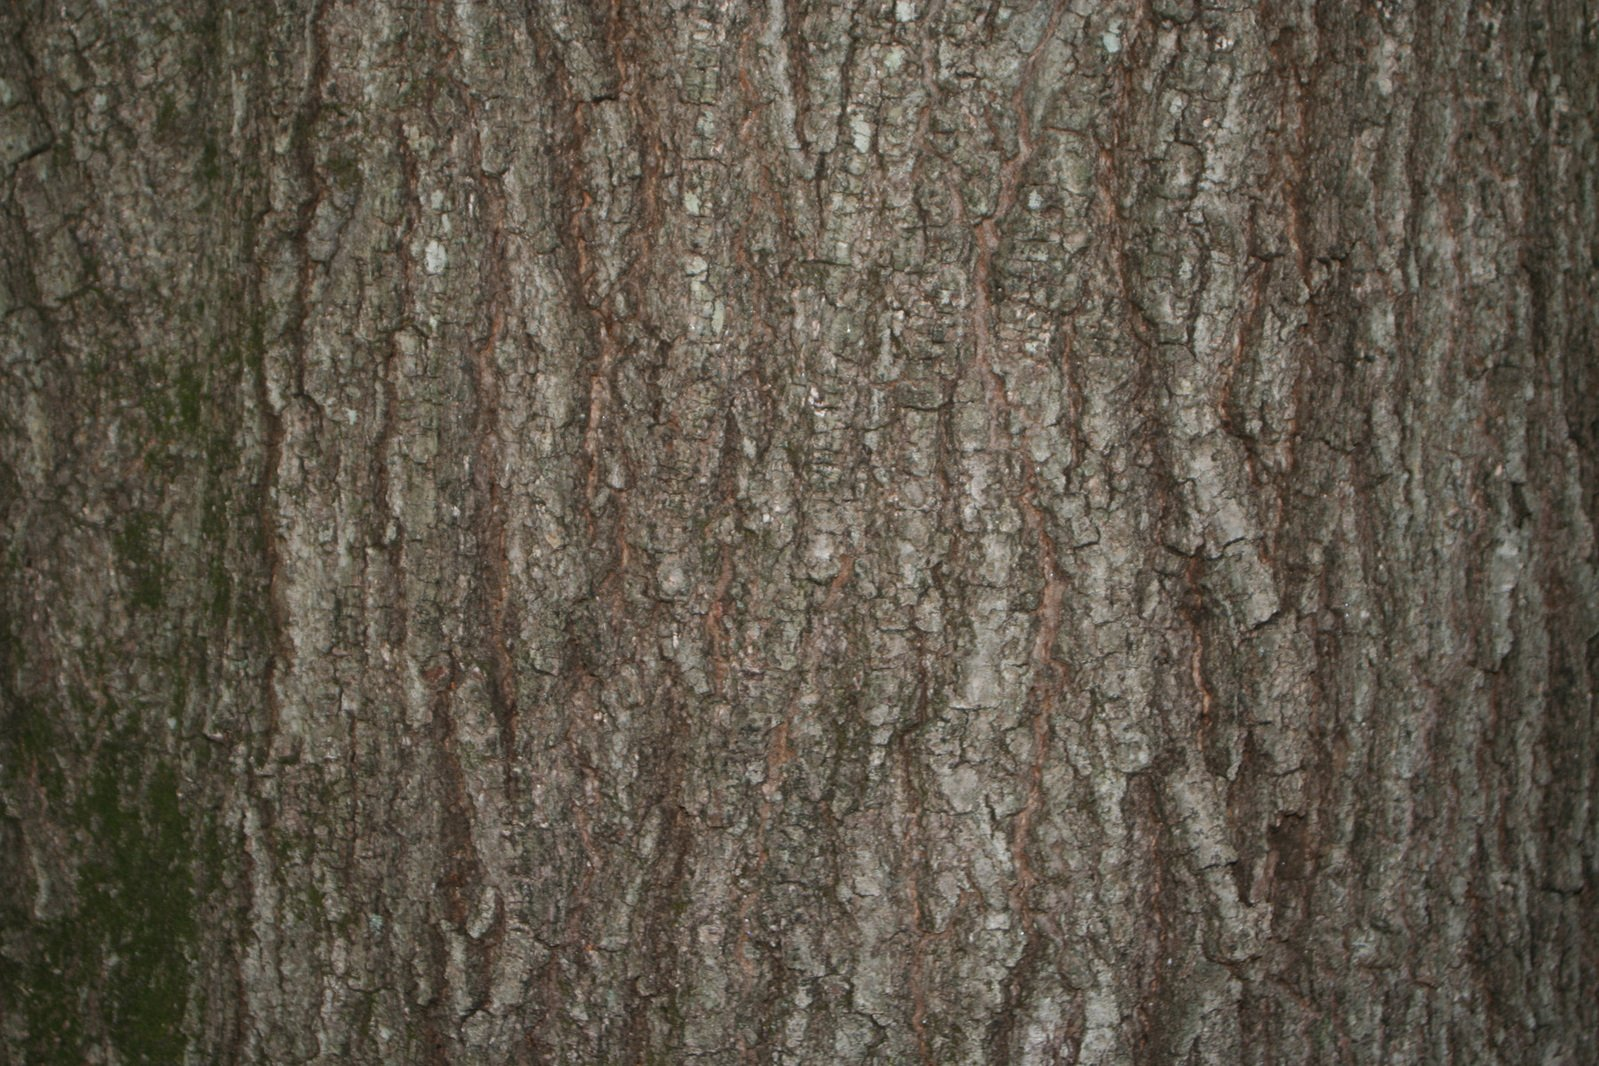 Free Willow Oak Fast Growning Small Leaf Oak Stock Photo